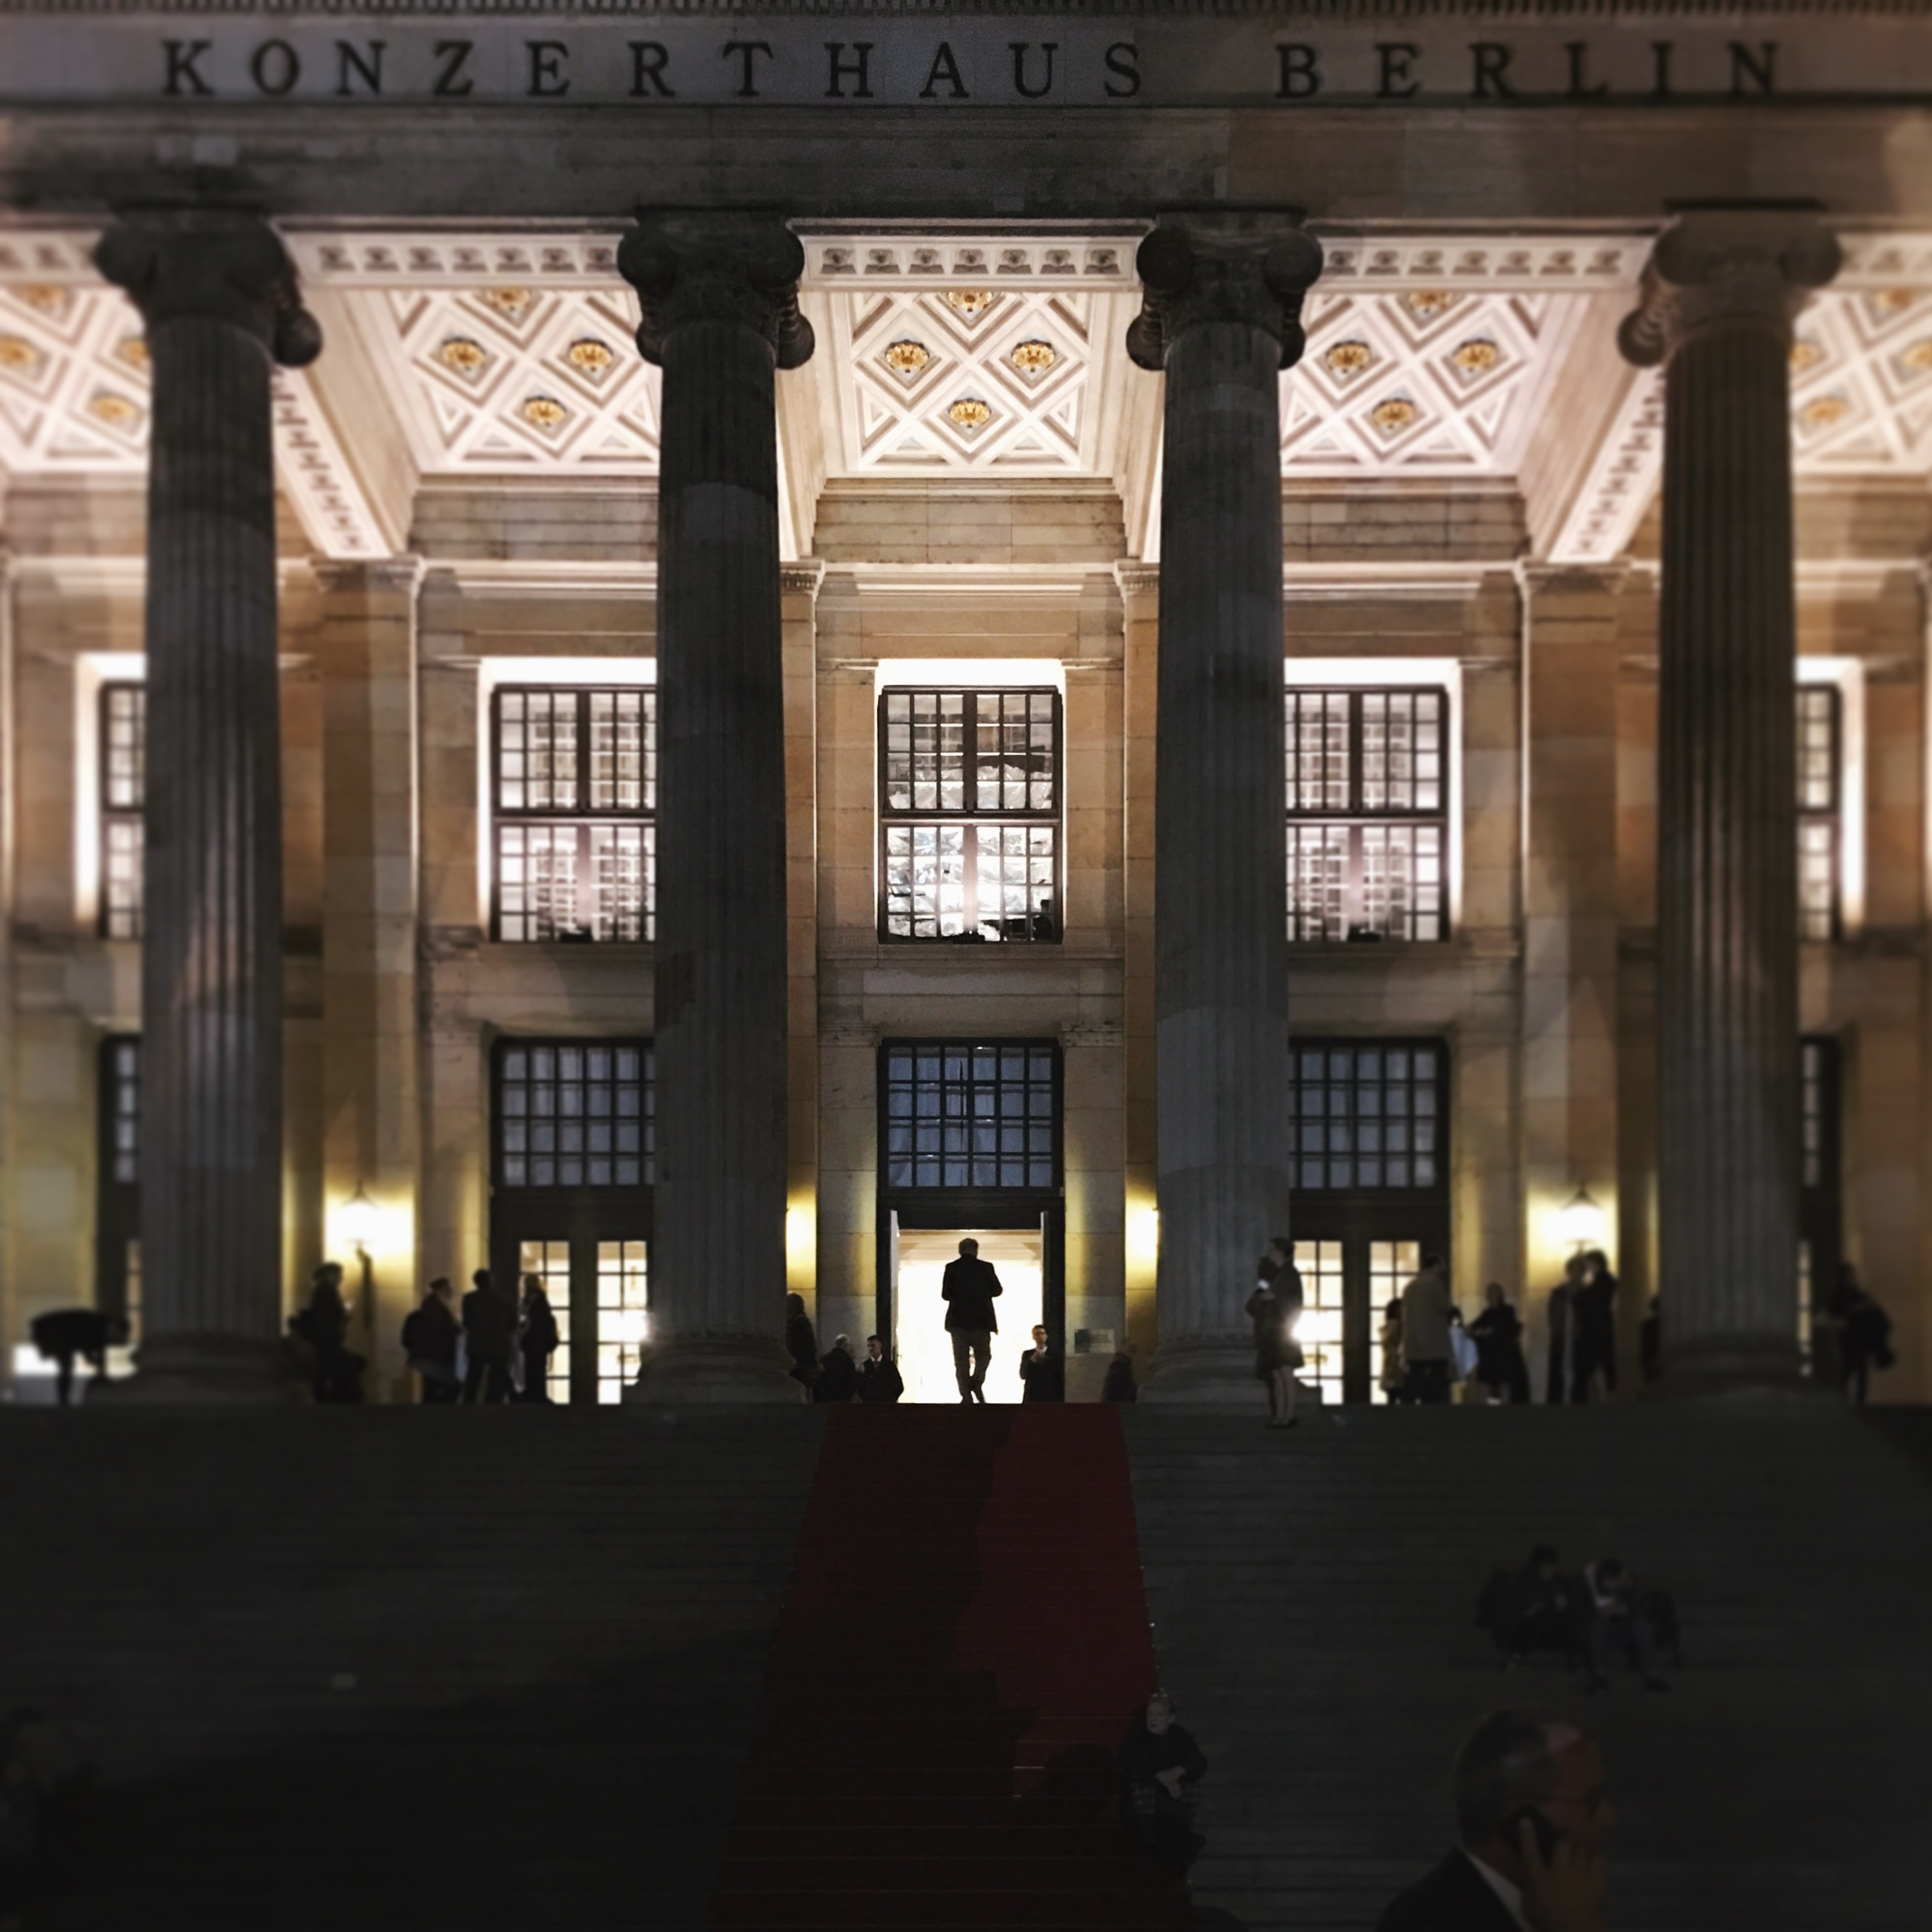 Das Konzerthaus Berlin by Elena Mazzoni Wagner - Sep/Oct 2016